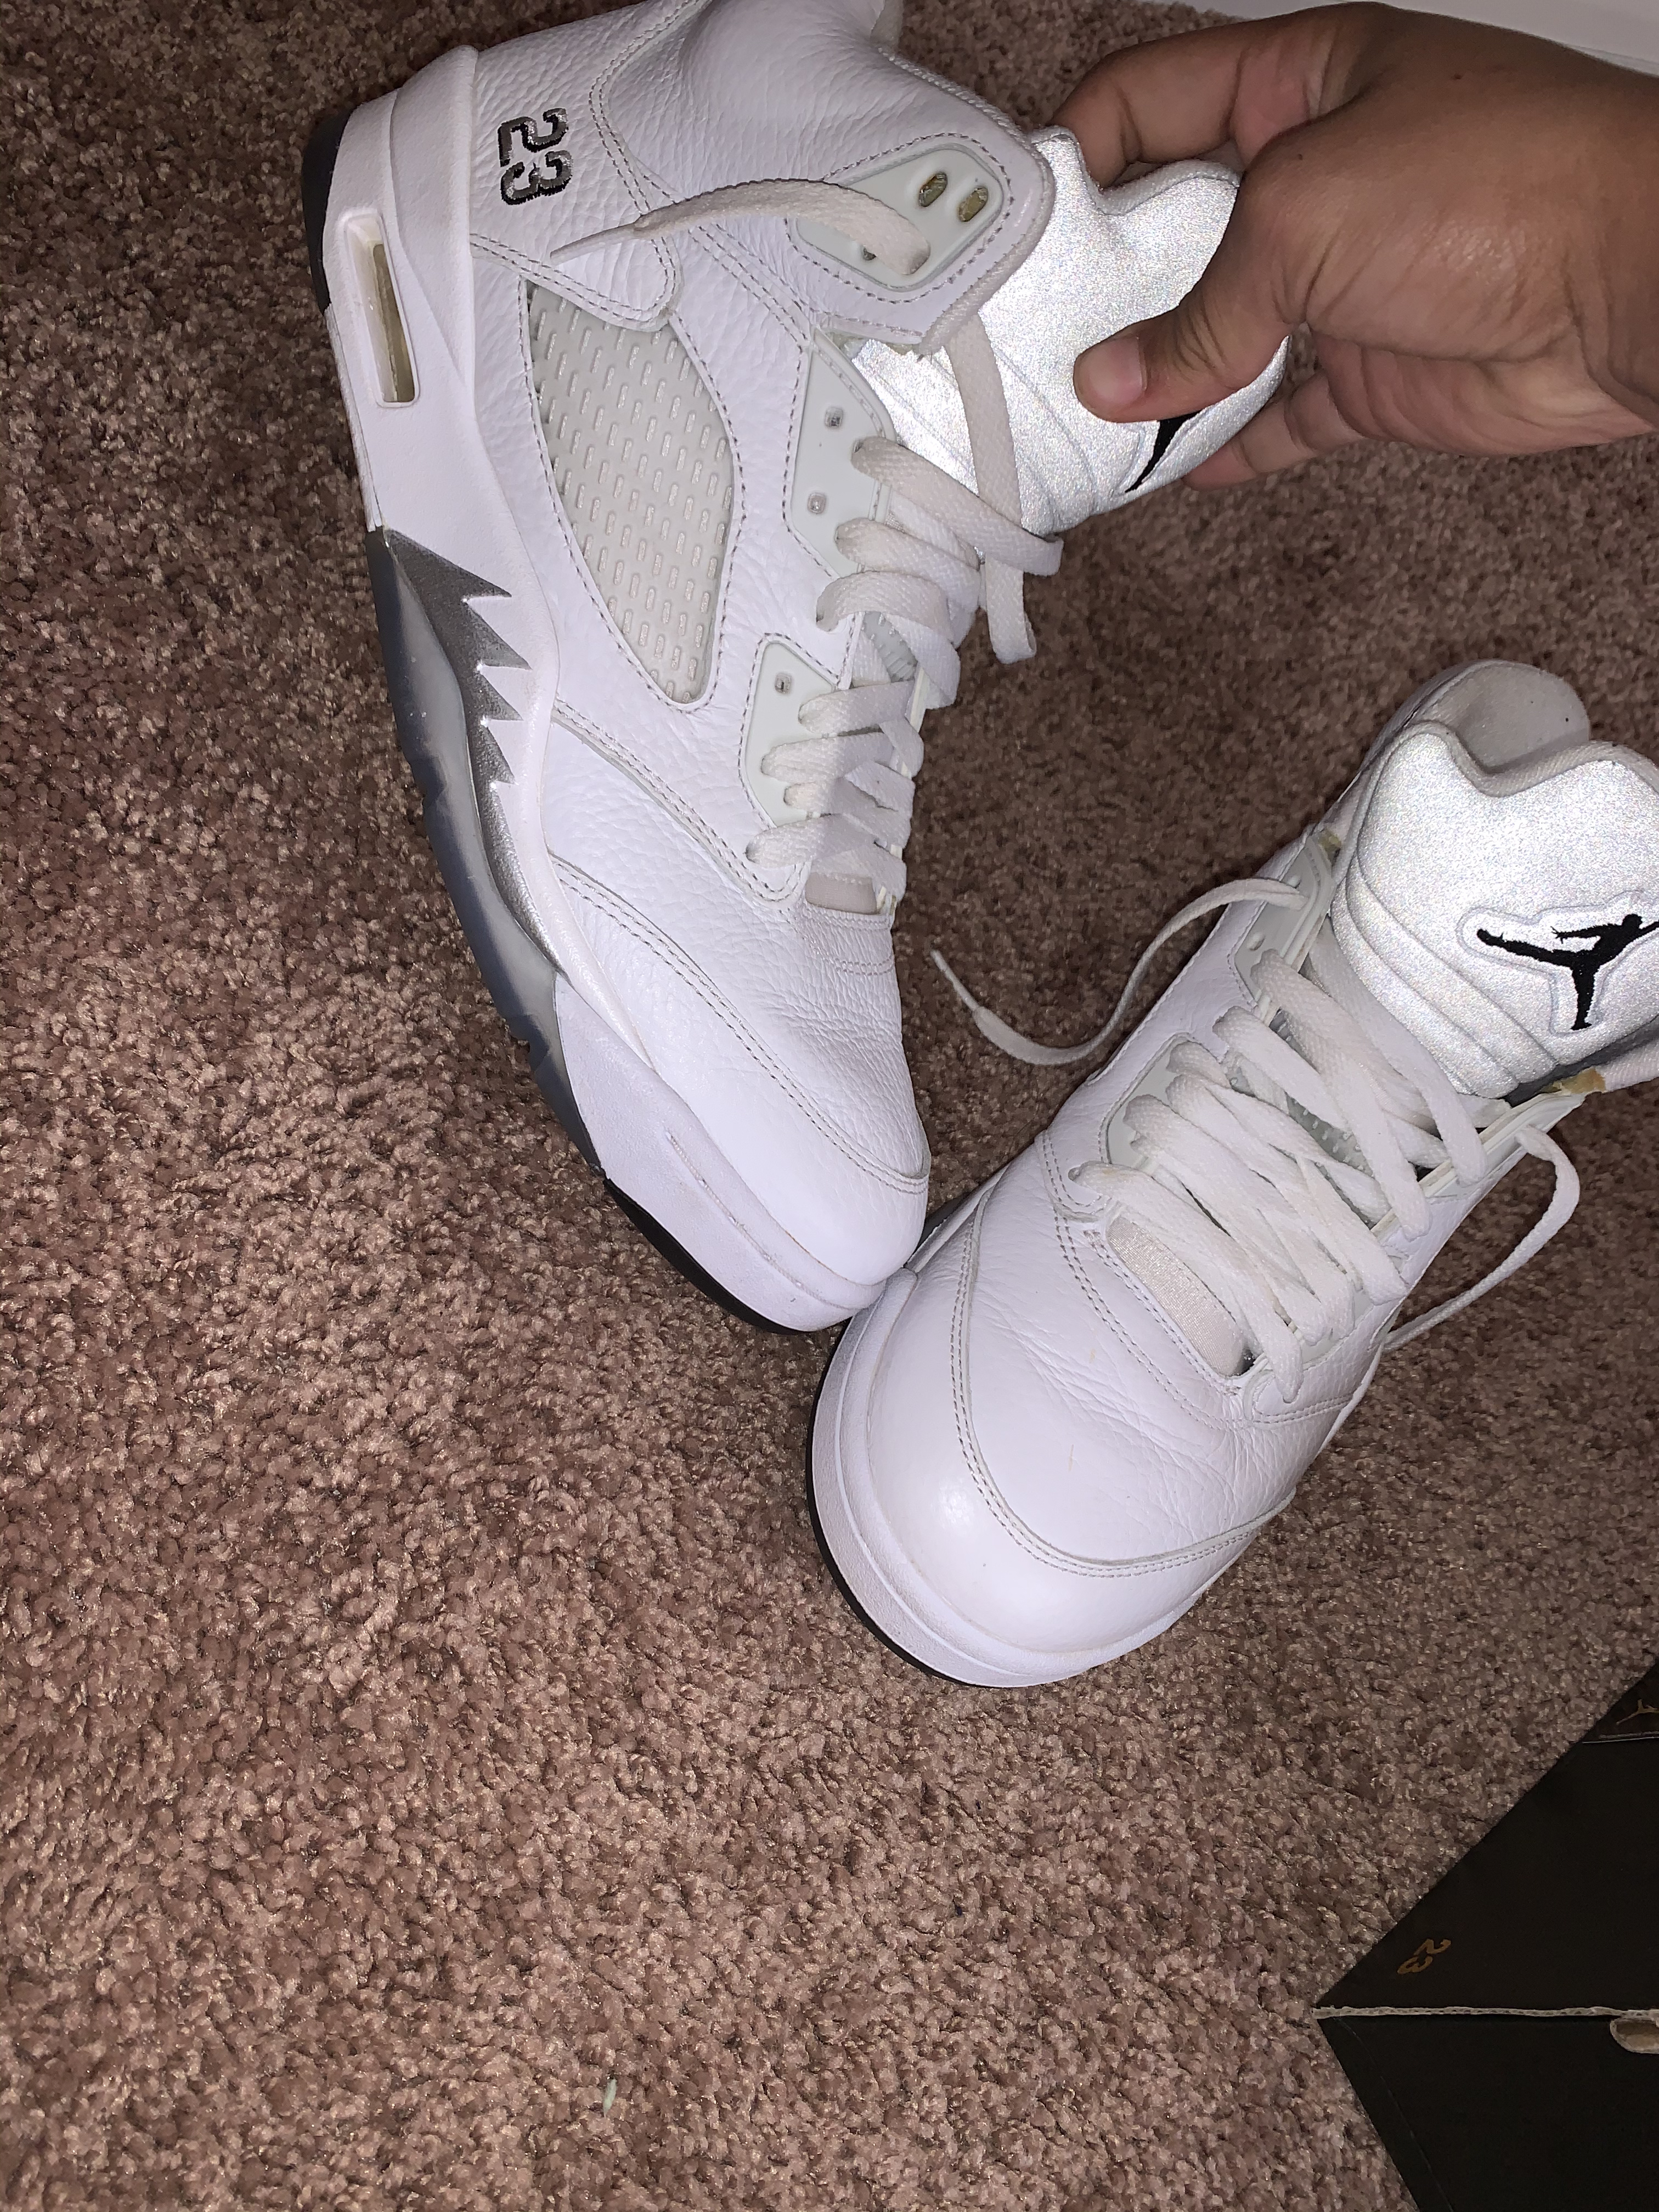 Air Jordan - $200 - Size 9.5